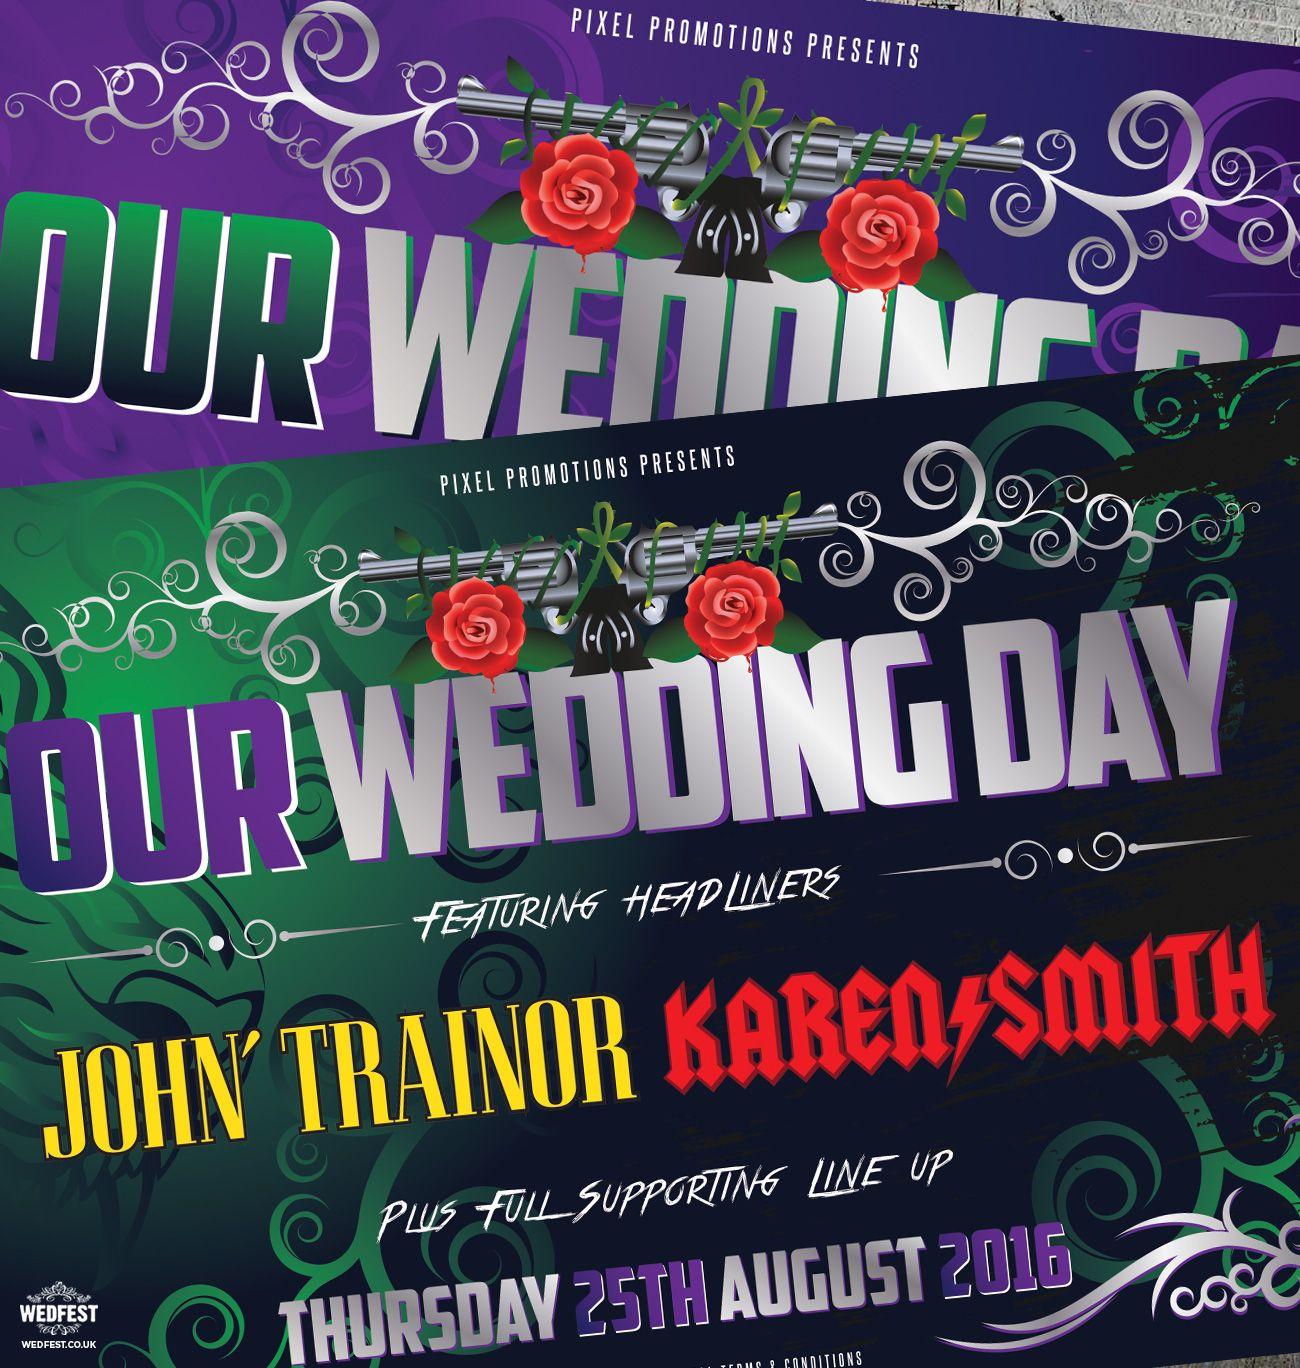 Heavy Metal Concert Ticket Wedding Invitation Wedfestco: Heavy Metal Wedding Invitations At Websimilar.org